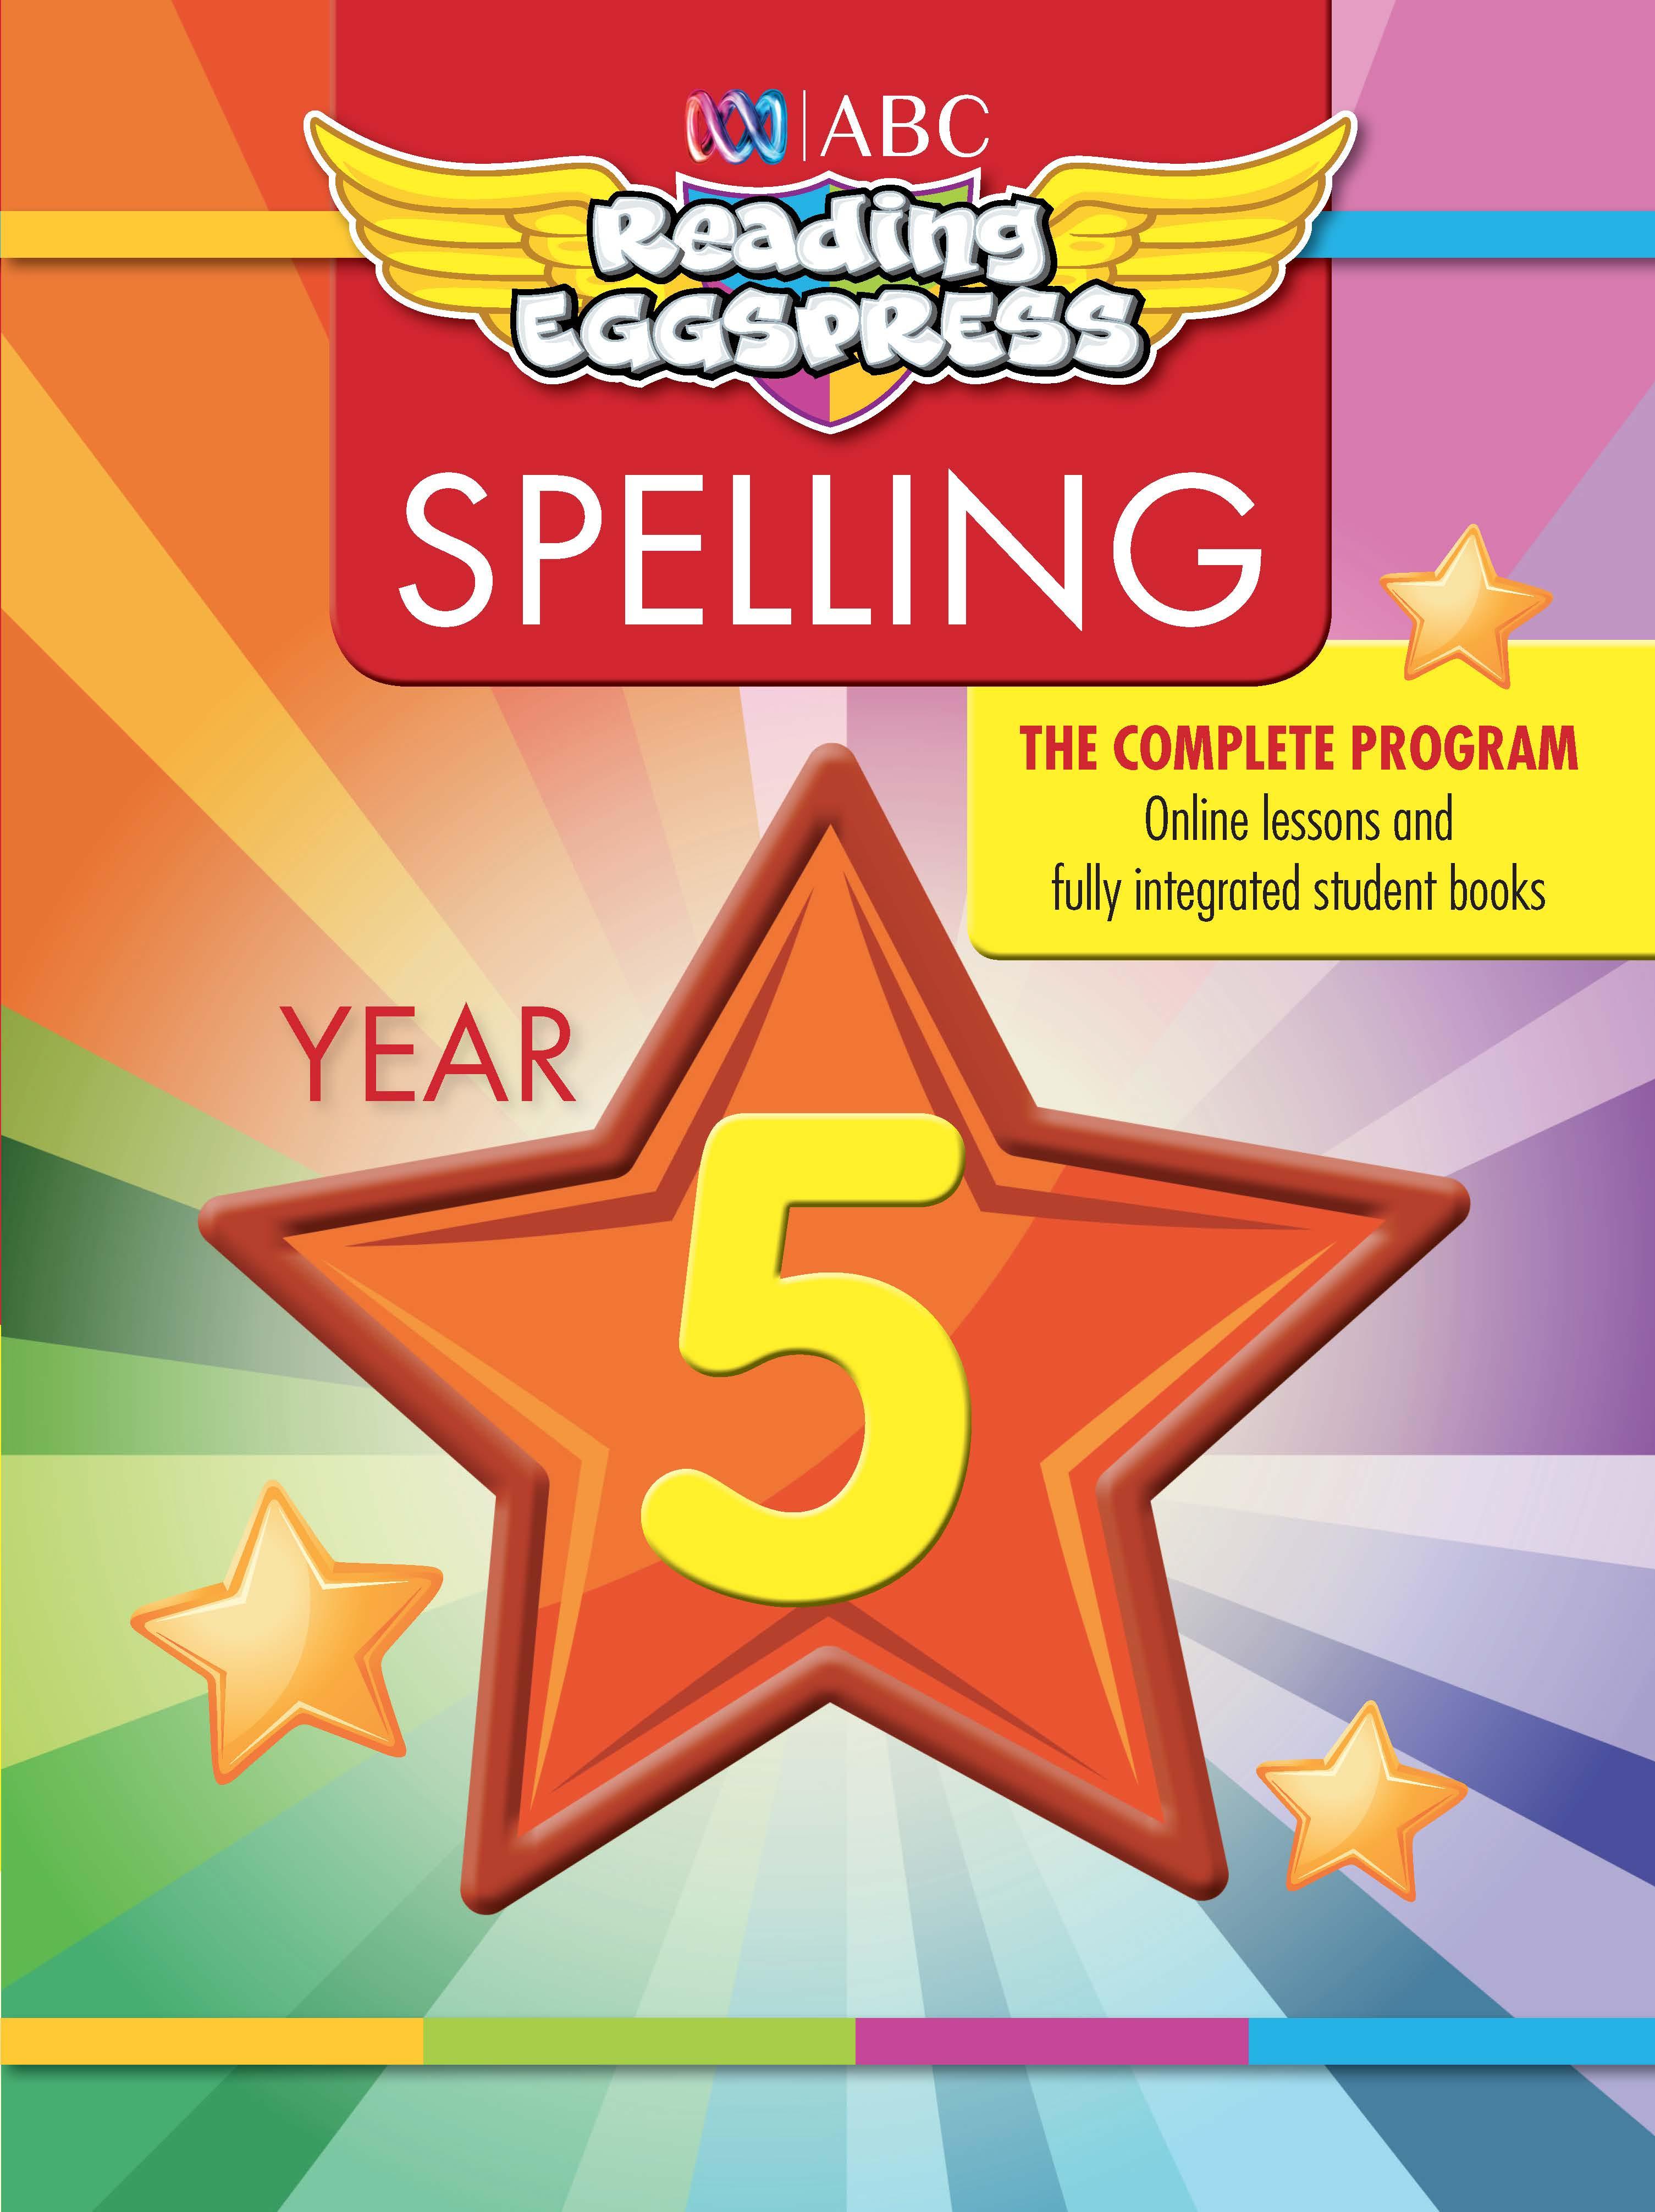 ABC Reading Eggspress Spelling Workbook Year 5